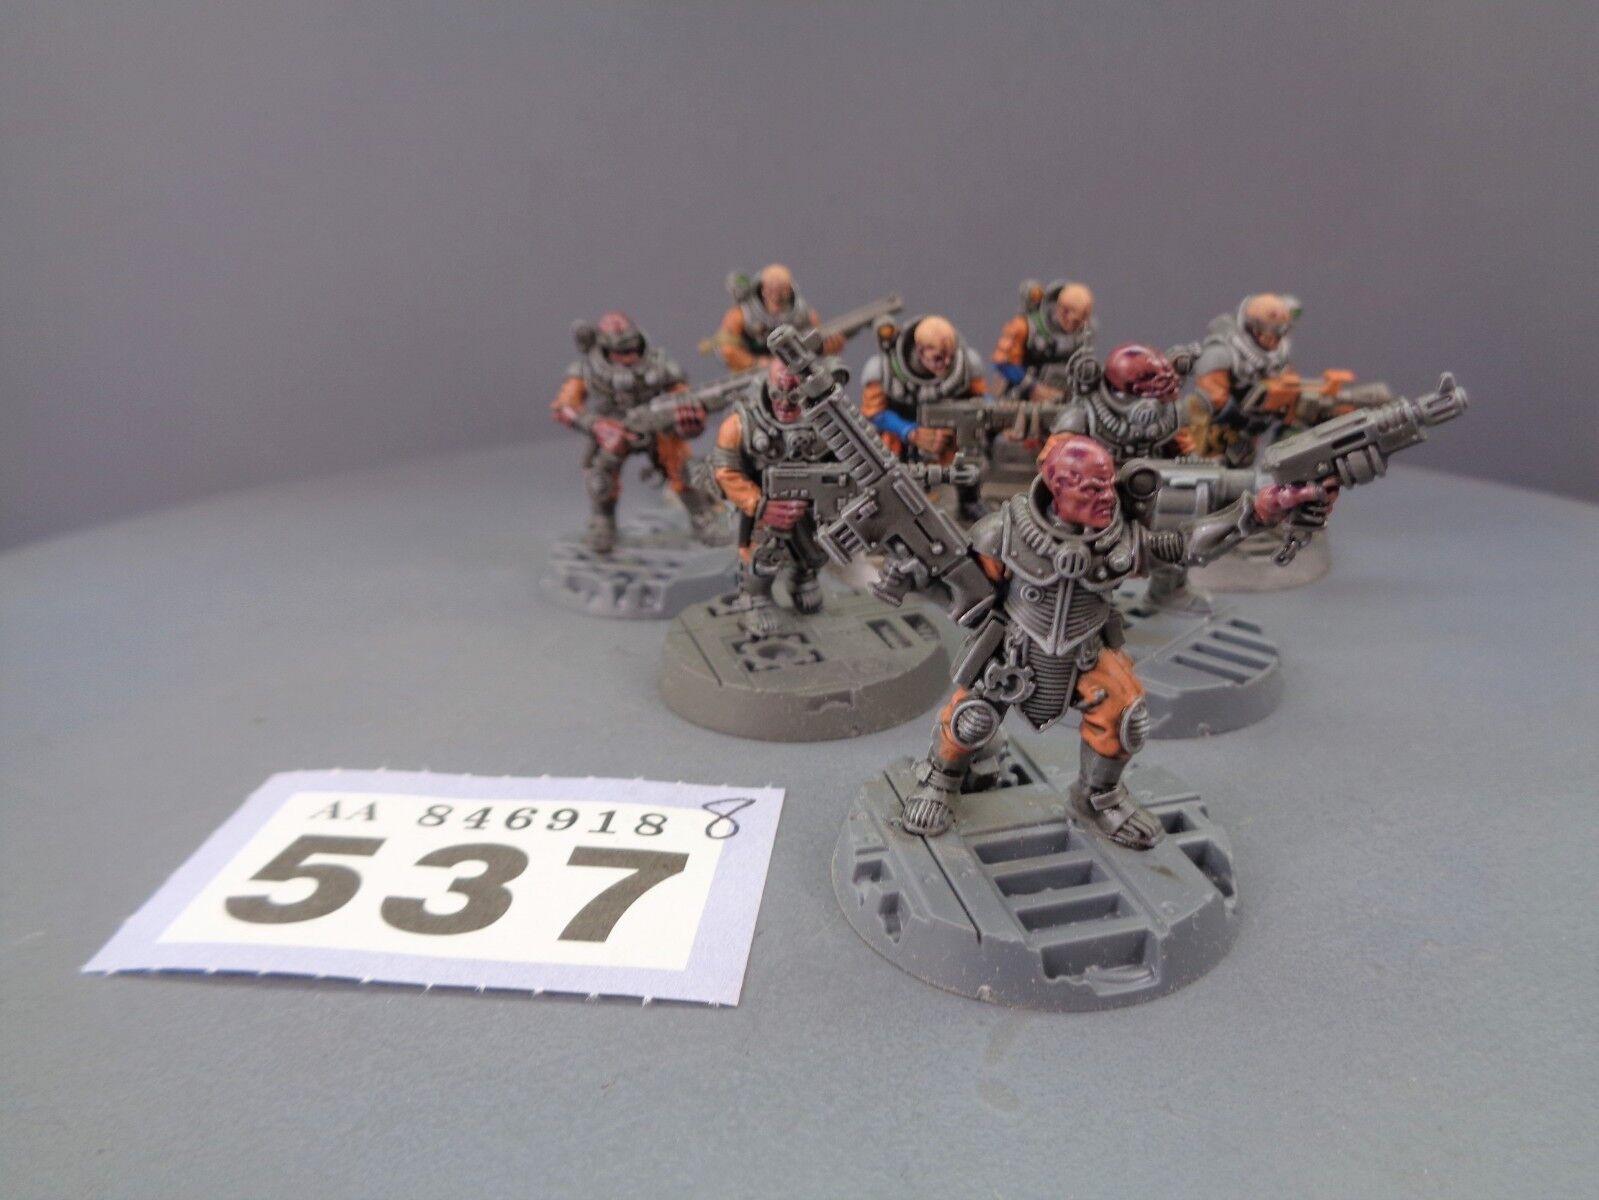 Warhammer 40,000 Tyranids Genestealer Cult Neophyte Hybrids 537